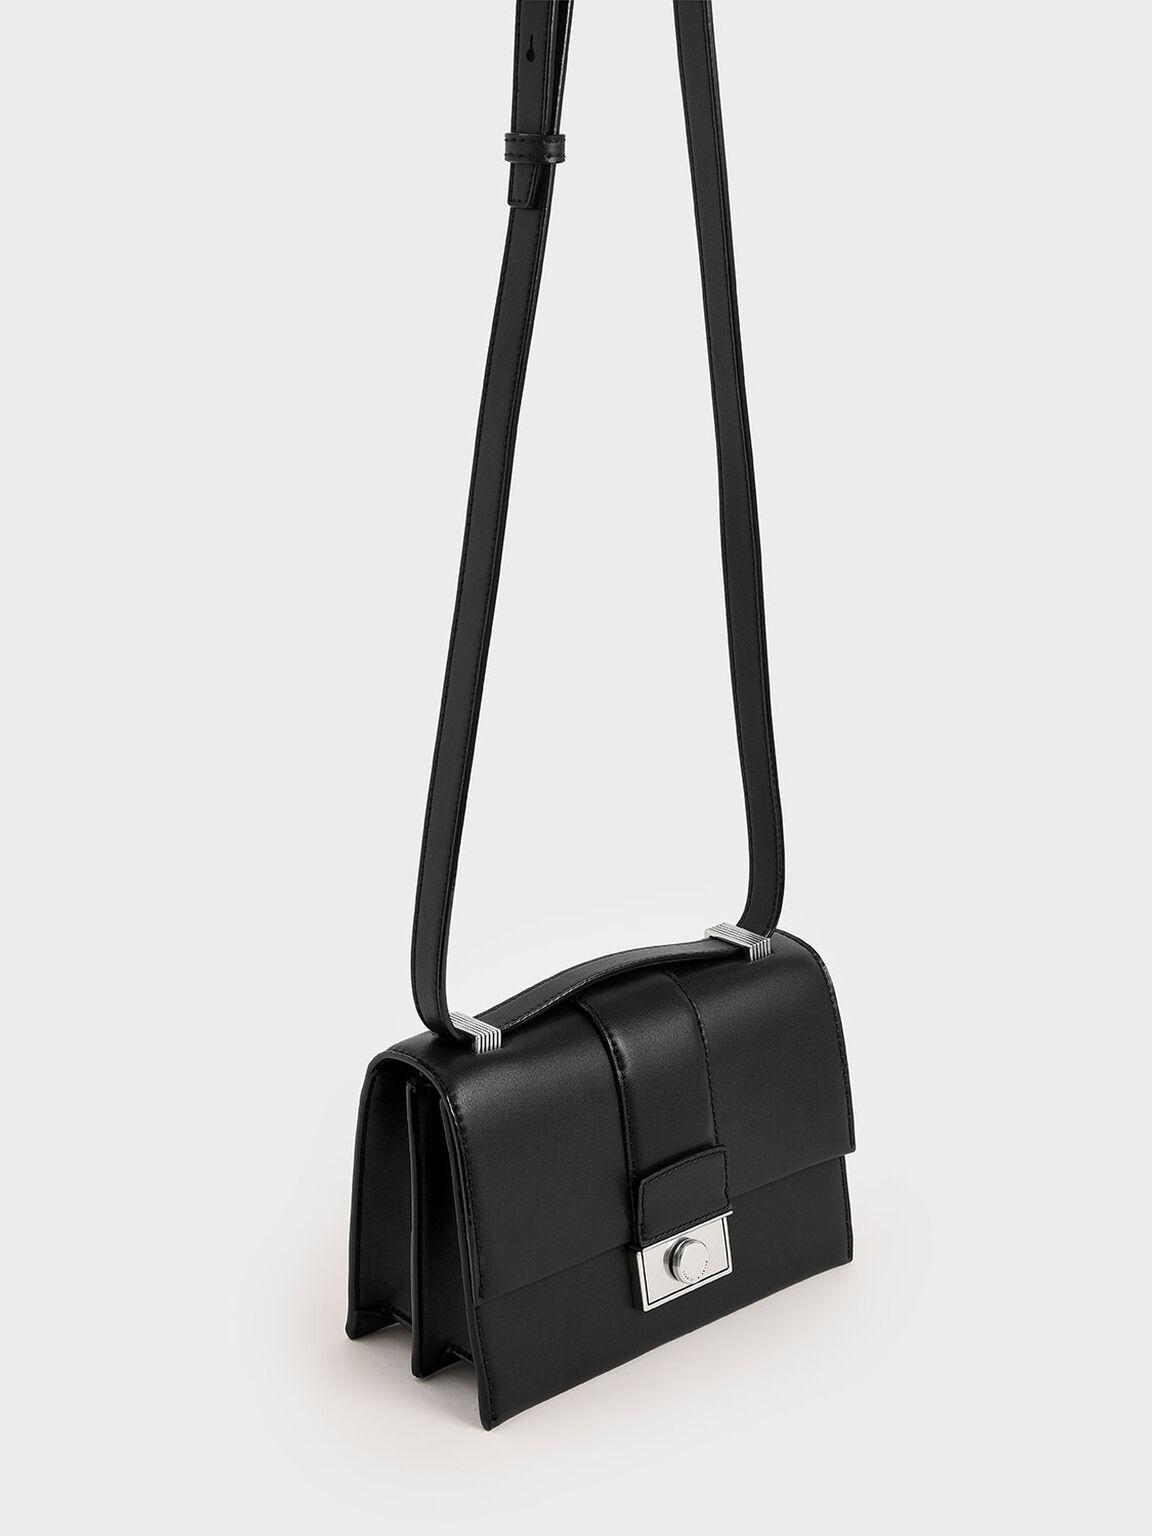 Metallic Push-Lock Crossbody Bag, Black, hi-res